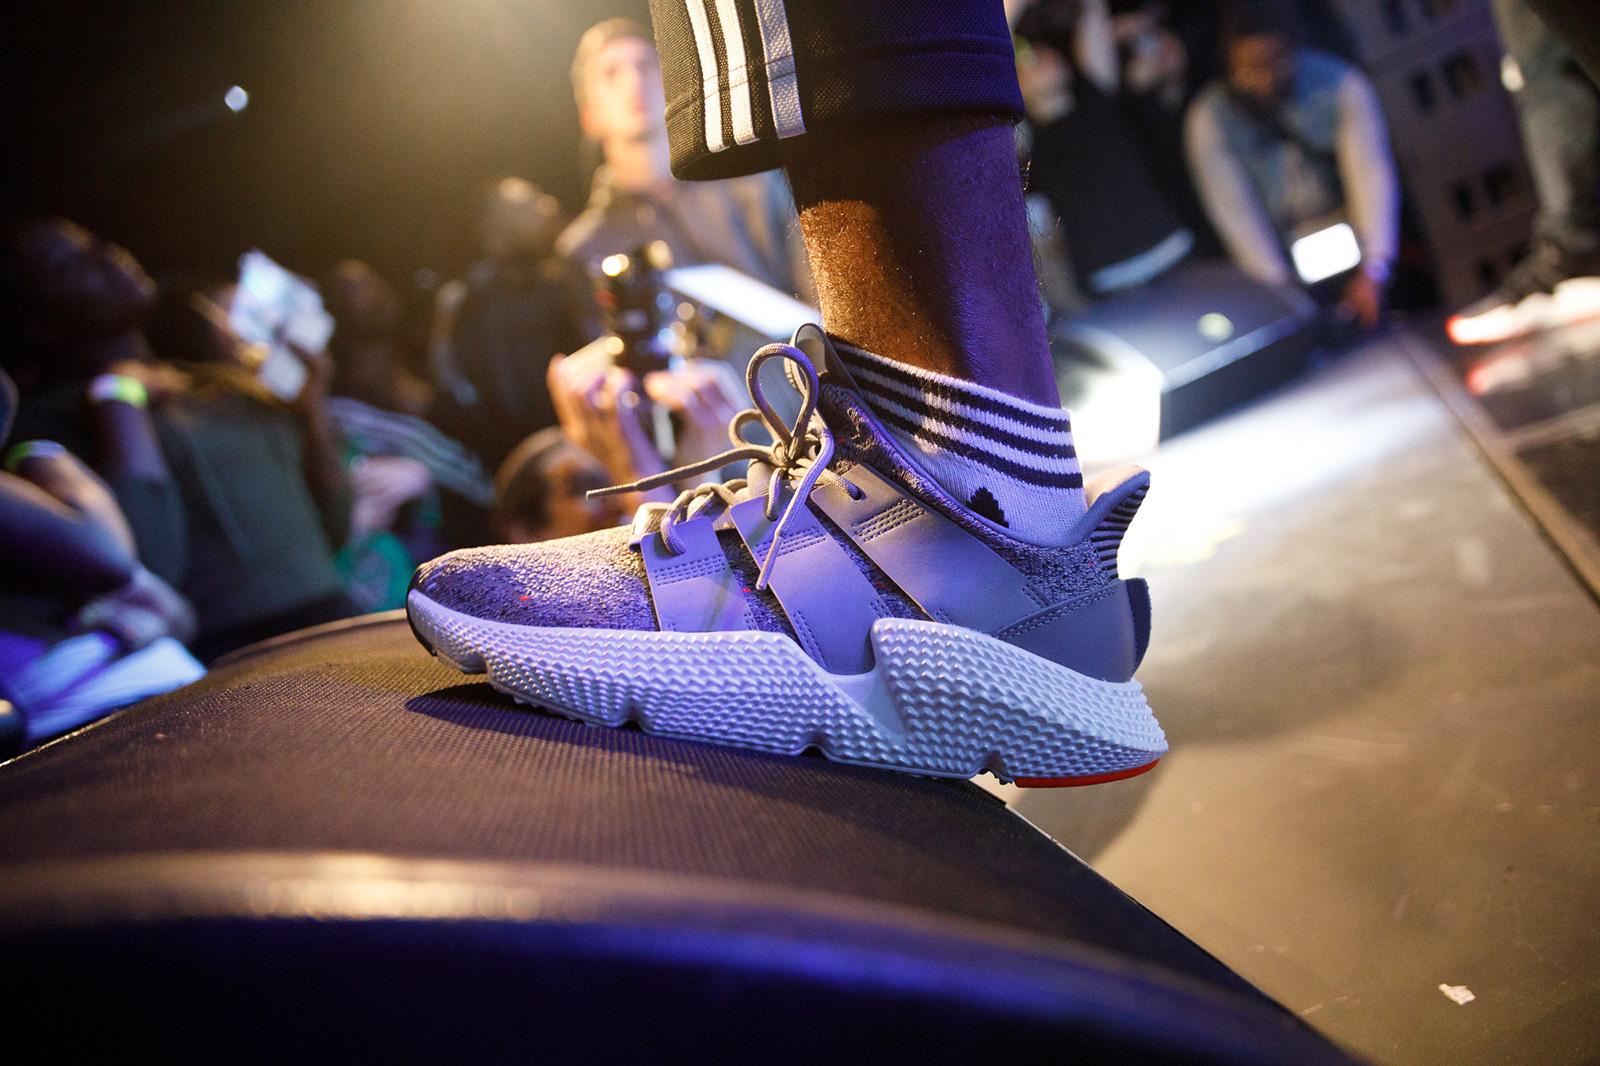 Adidas-Prophere-END-2000px-20171204220444-2307.jpg